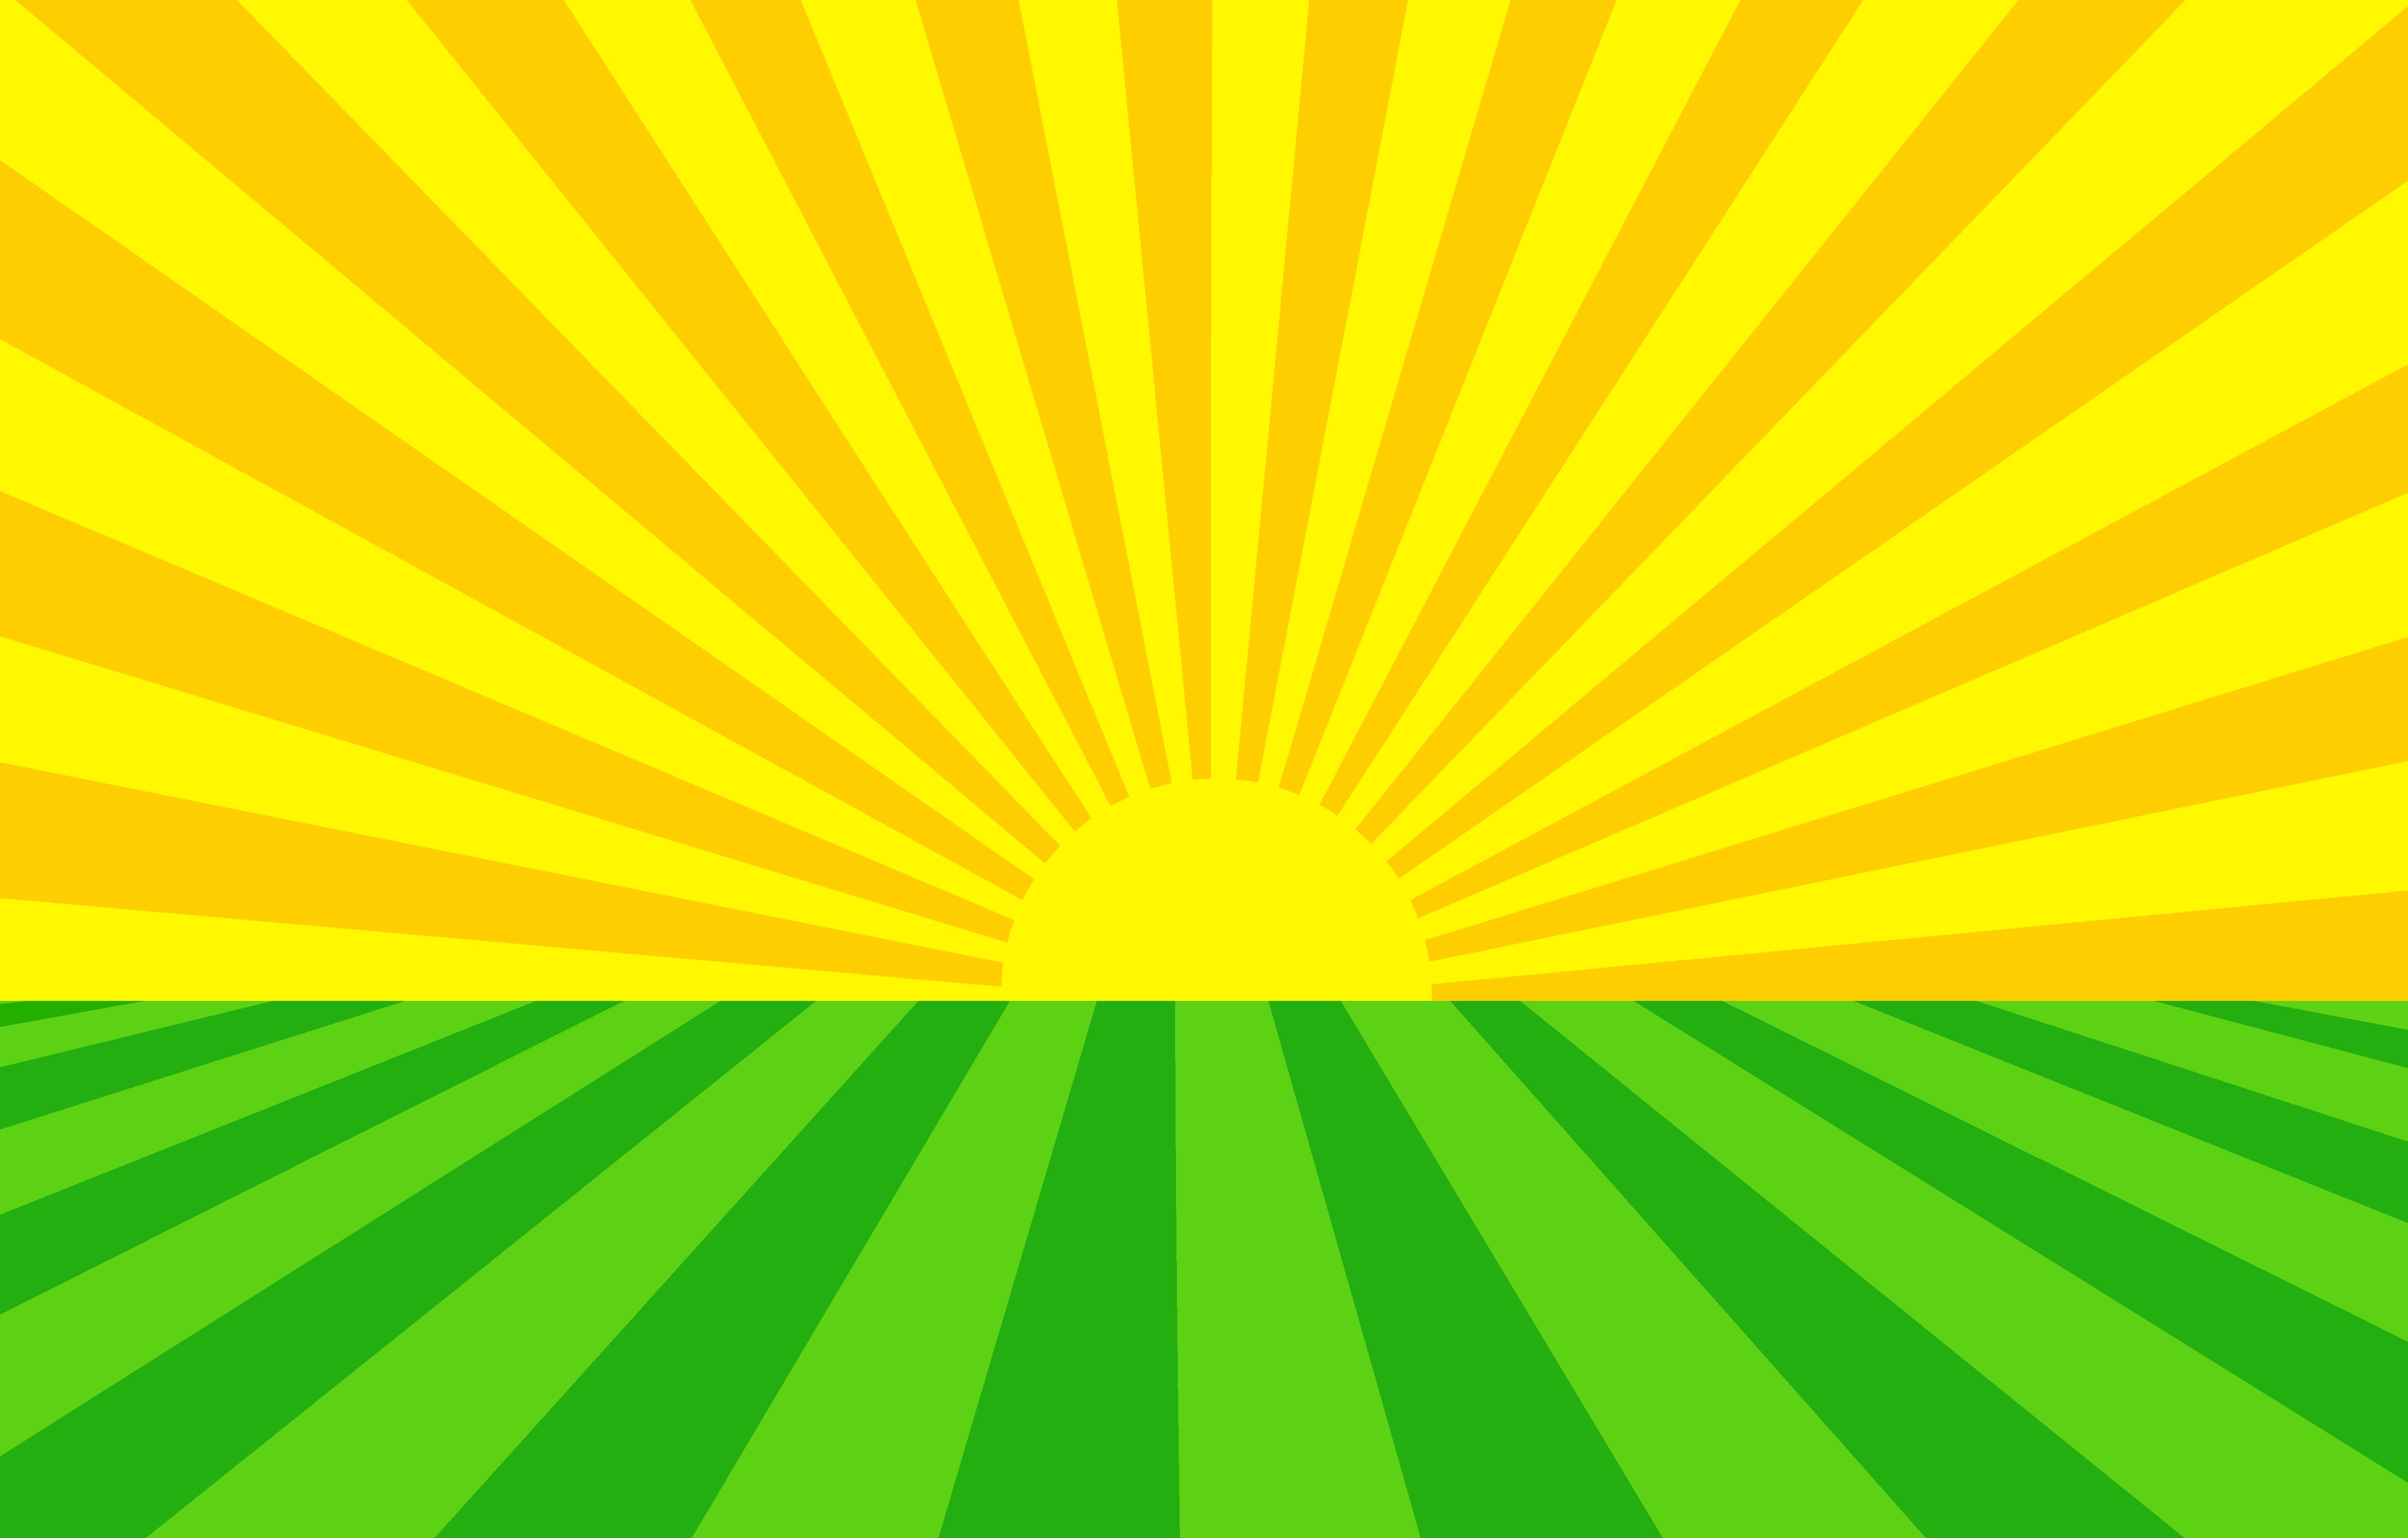 Sunshine background clipart.